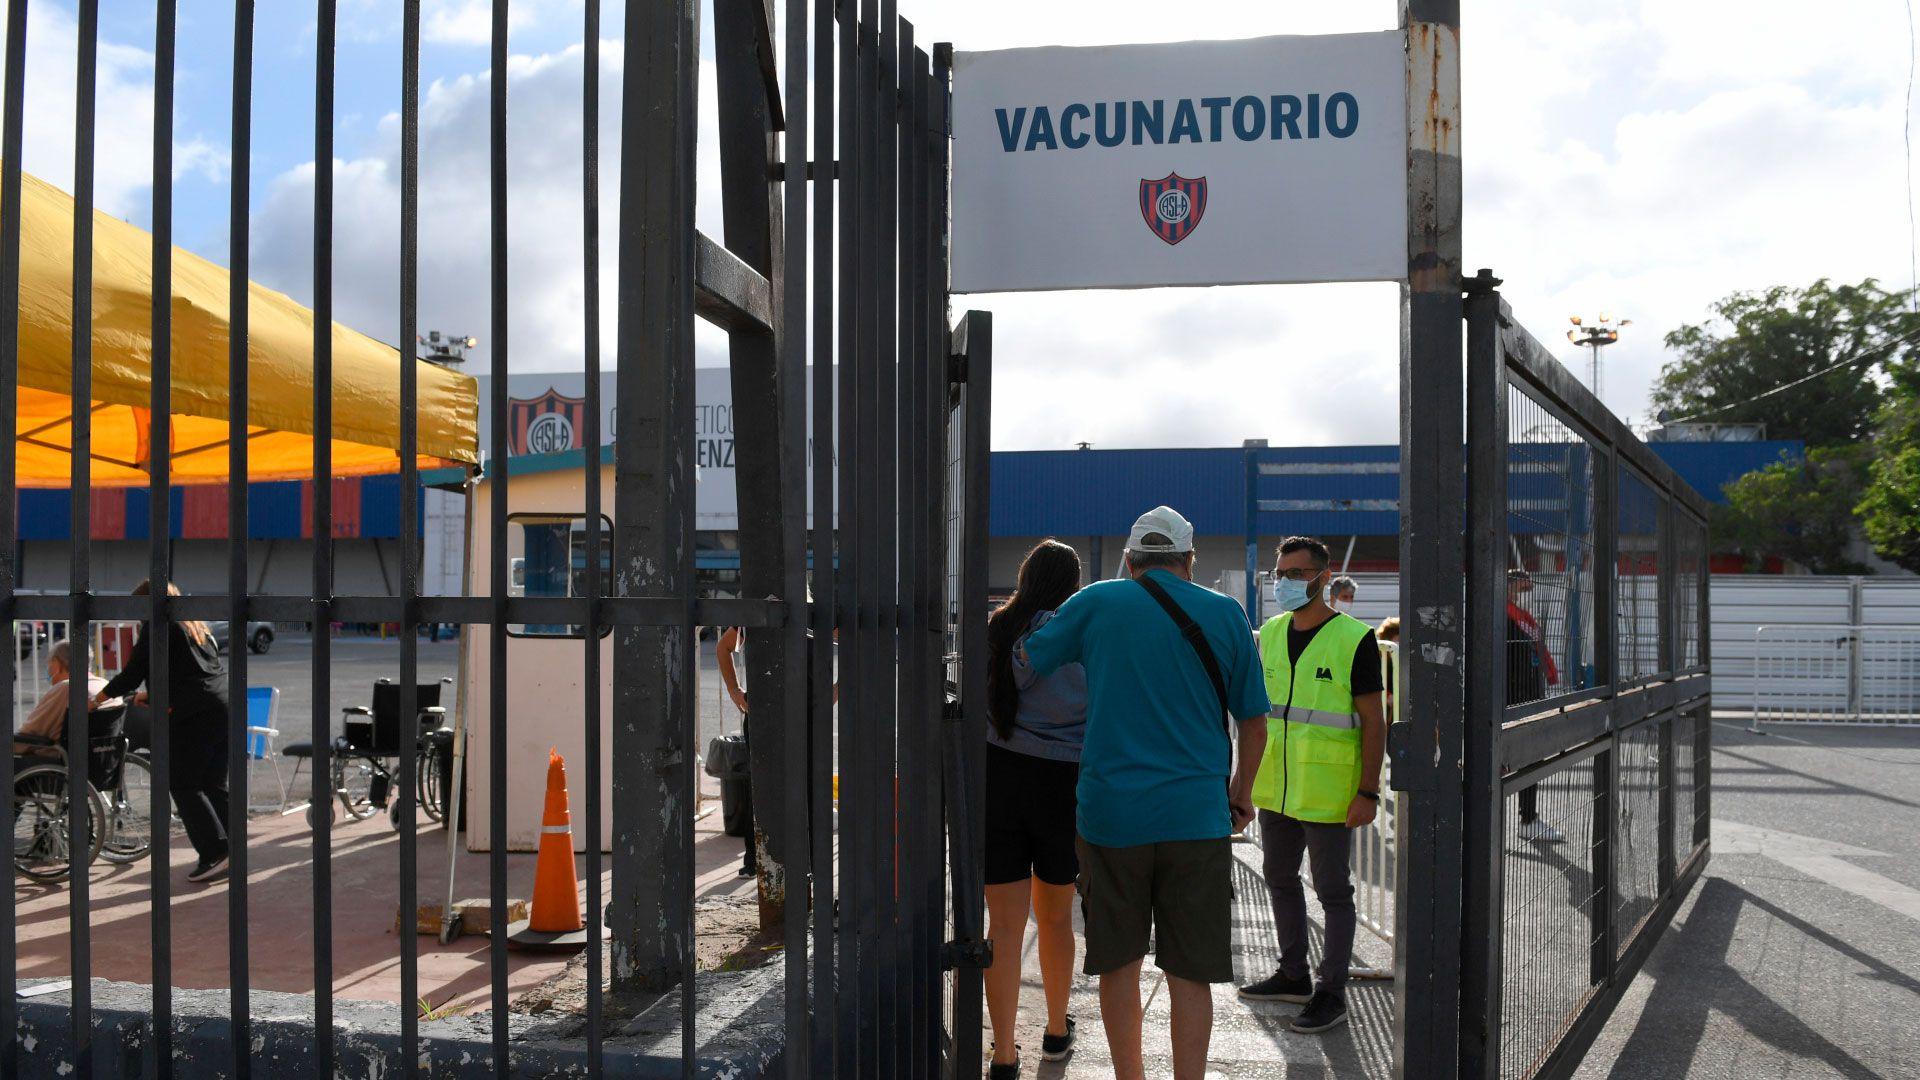 vacunatorio-san-lorenzo-vacunacion buenos aires covid 19 coronavirus